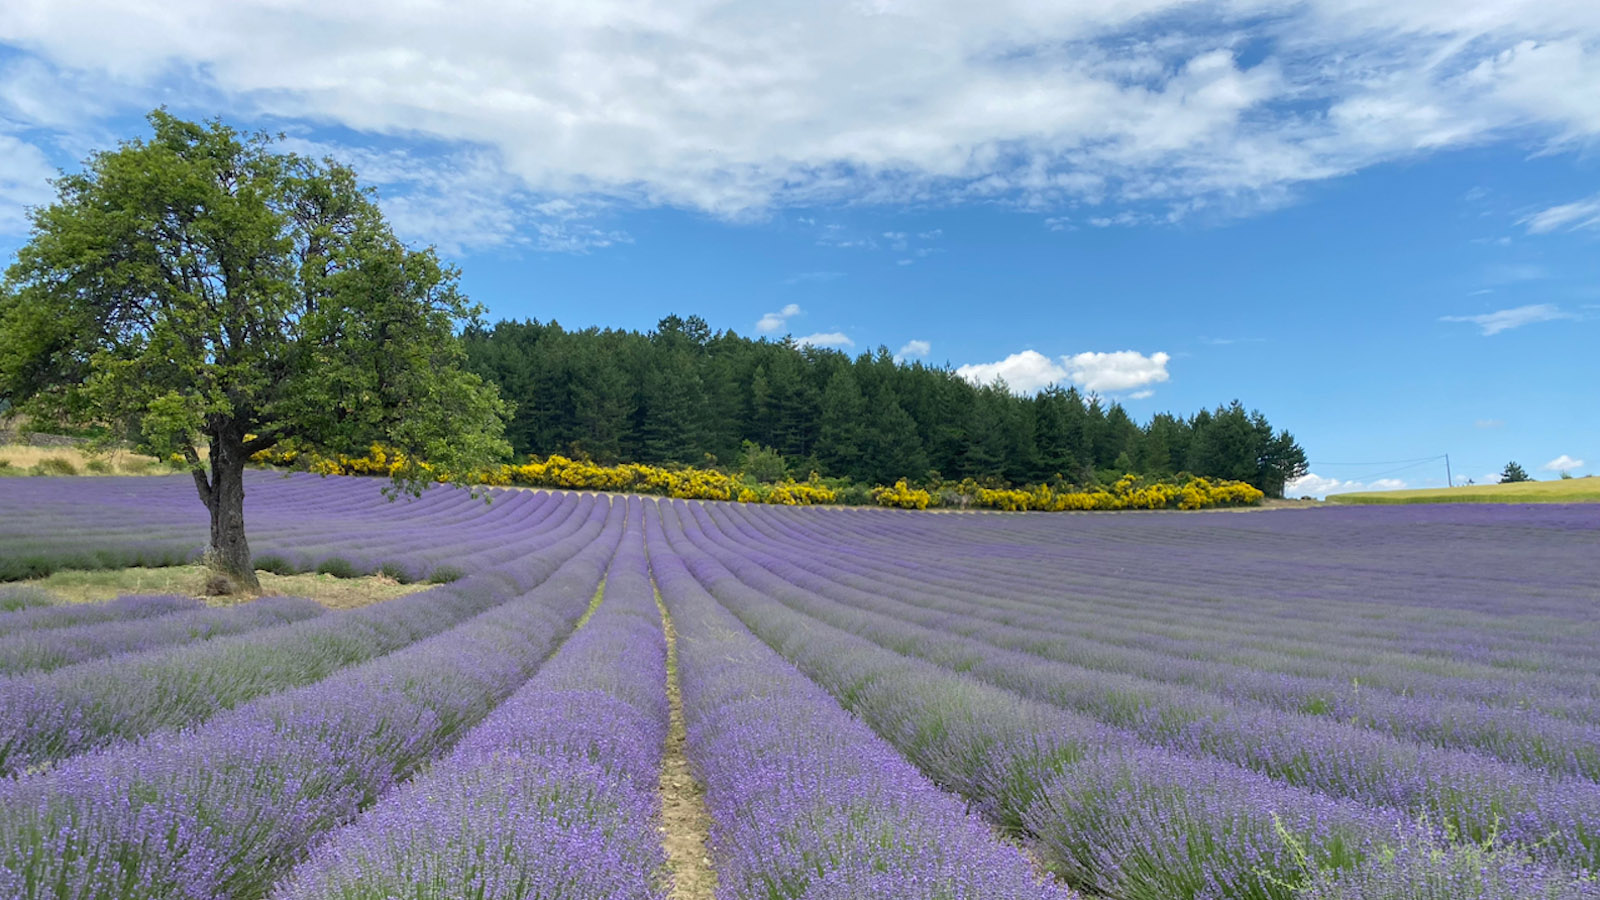 Lavendelfelder in der Drôme. Foto: ?